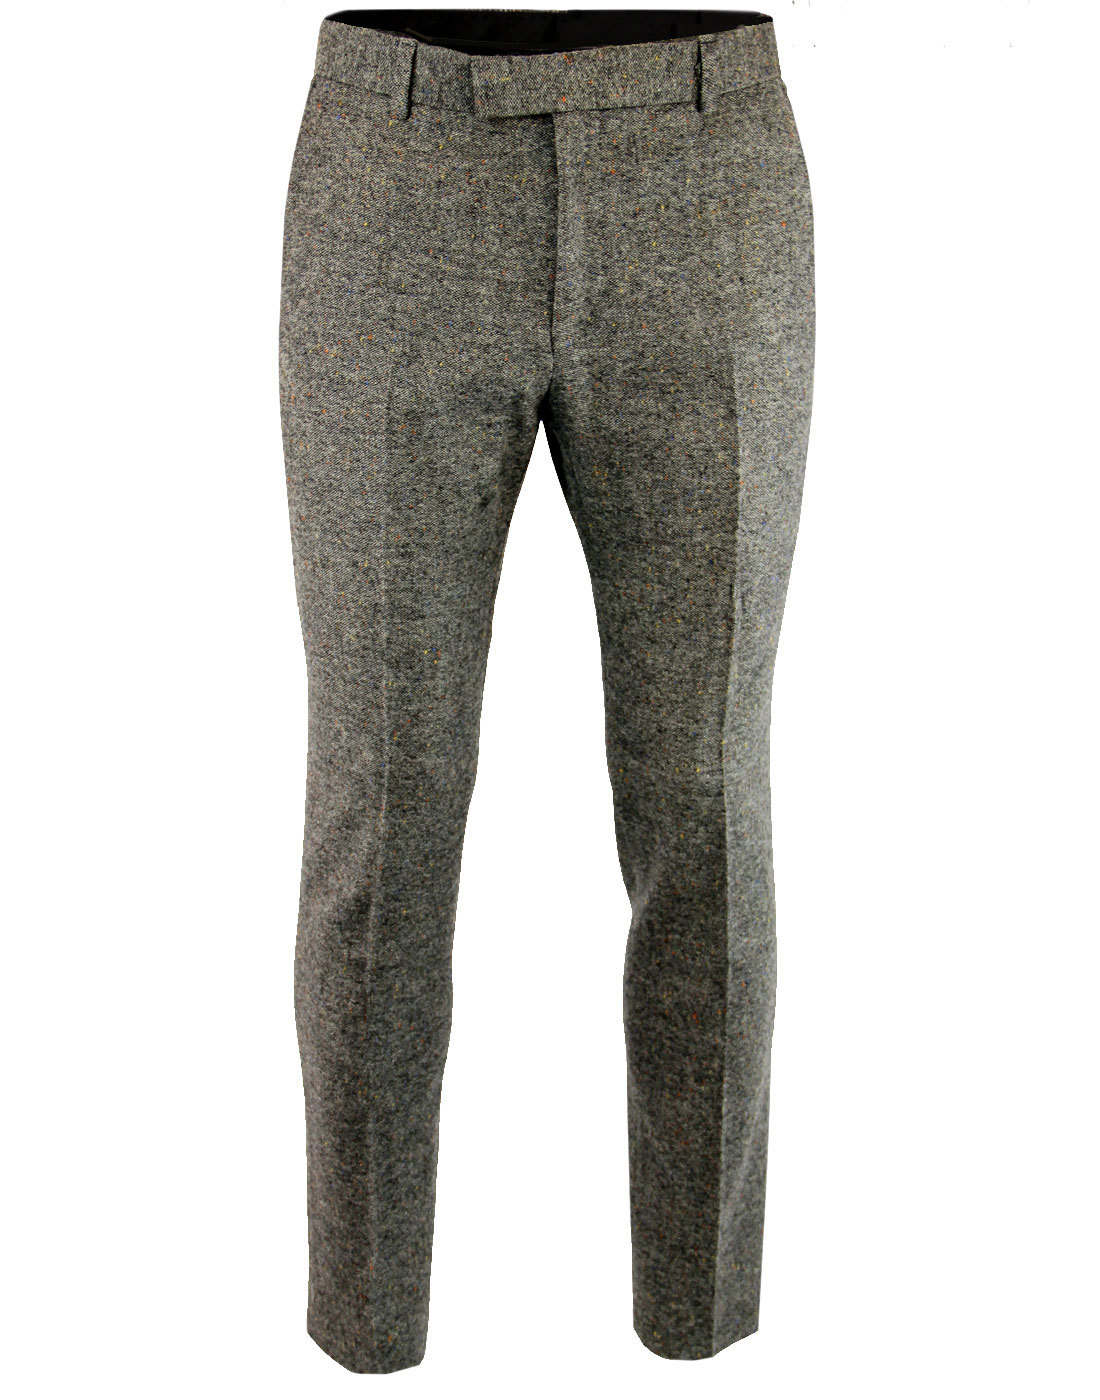 Madcap England 60s Mod Slim Donegal Suit Trousers